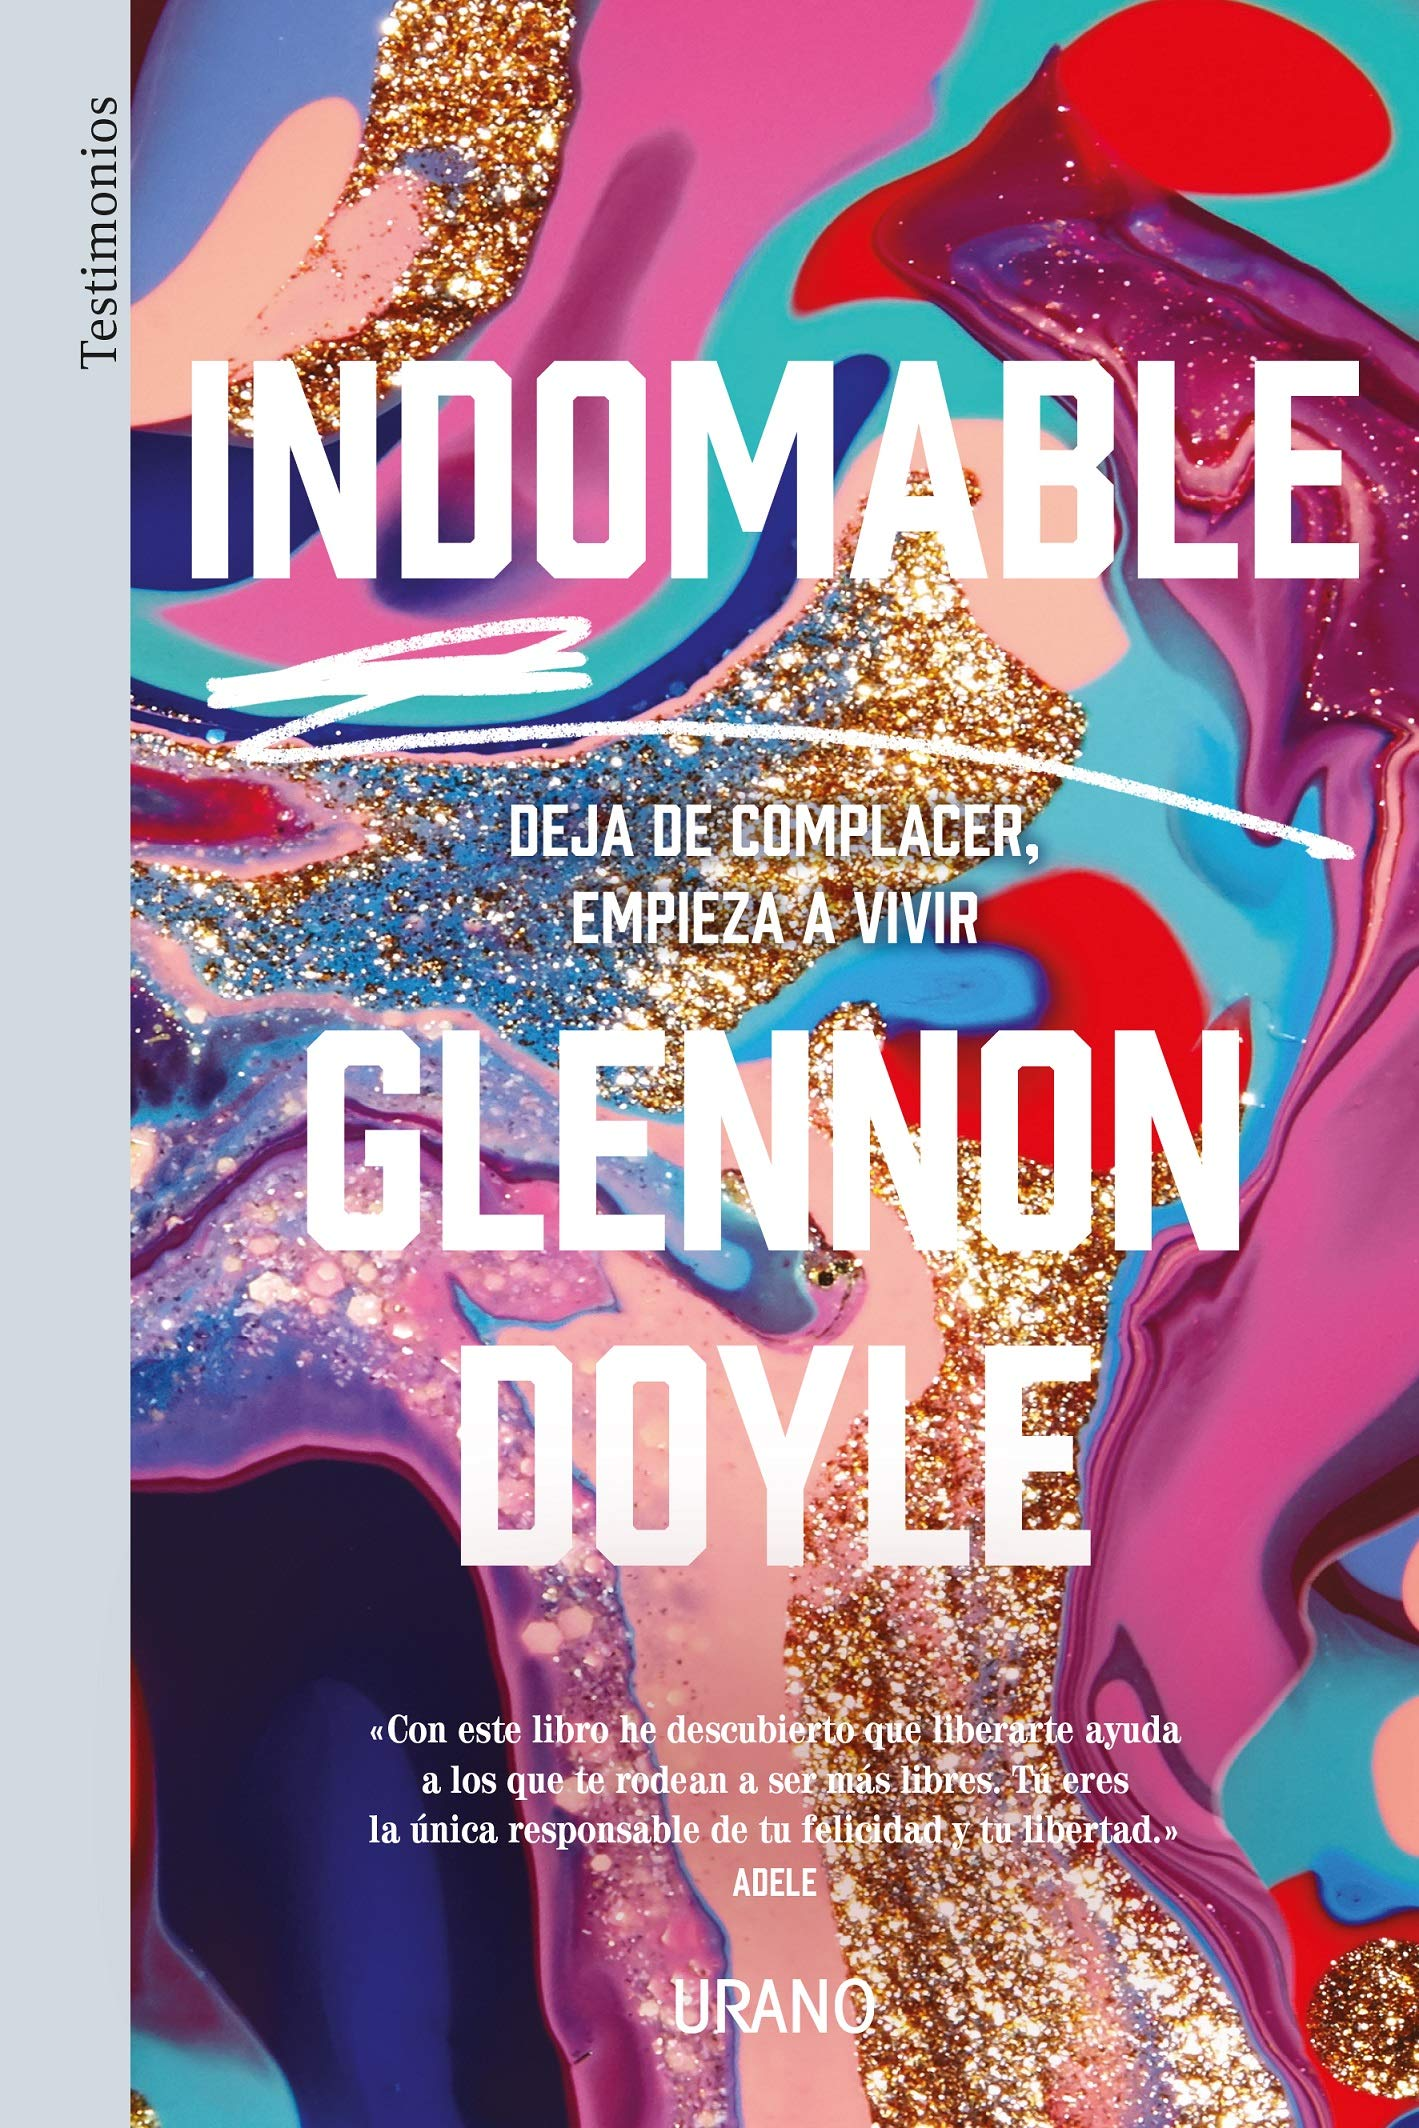 Indomable: Deja de complacer, empieza a vivir (Urano Testimonios) (Spanish  Edition): Doyle Melton, Glennon, Simó Perales, Victoria: 9788417694234:  Amazon.com: Books